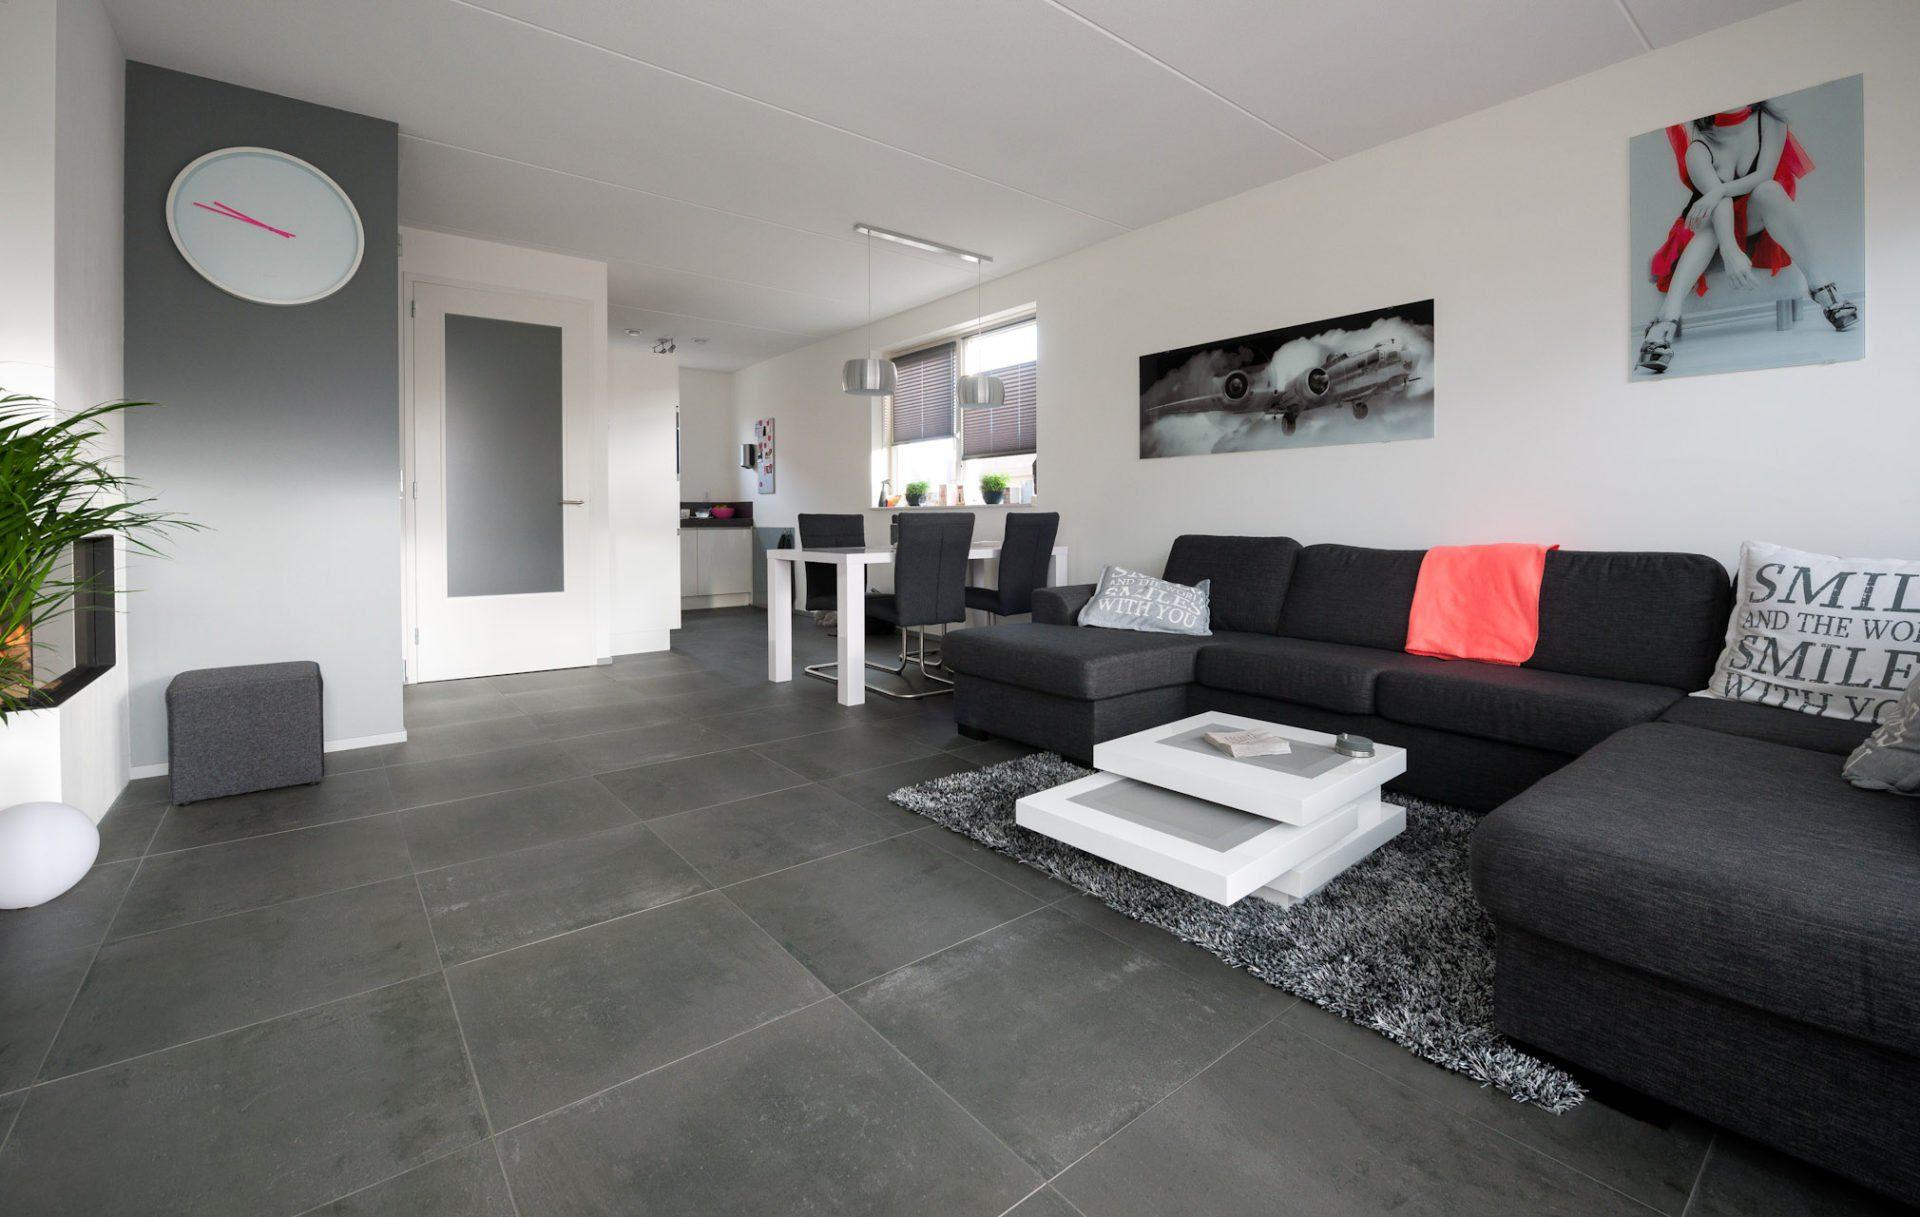 woonkamer inrichten donkere vloer – artsmedia, Deco ideeën